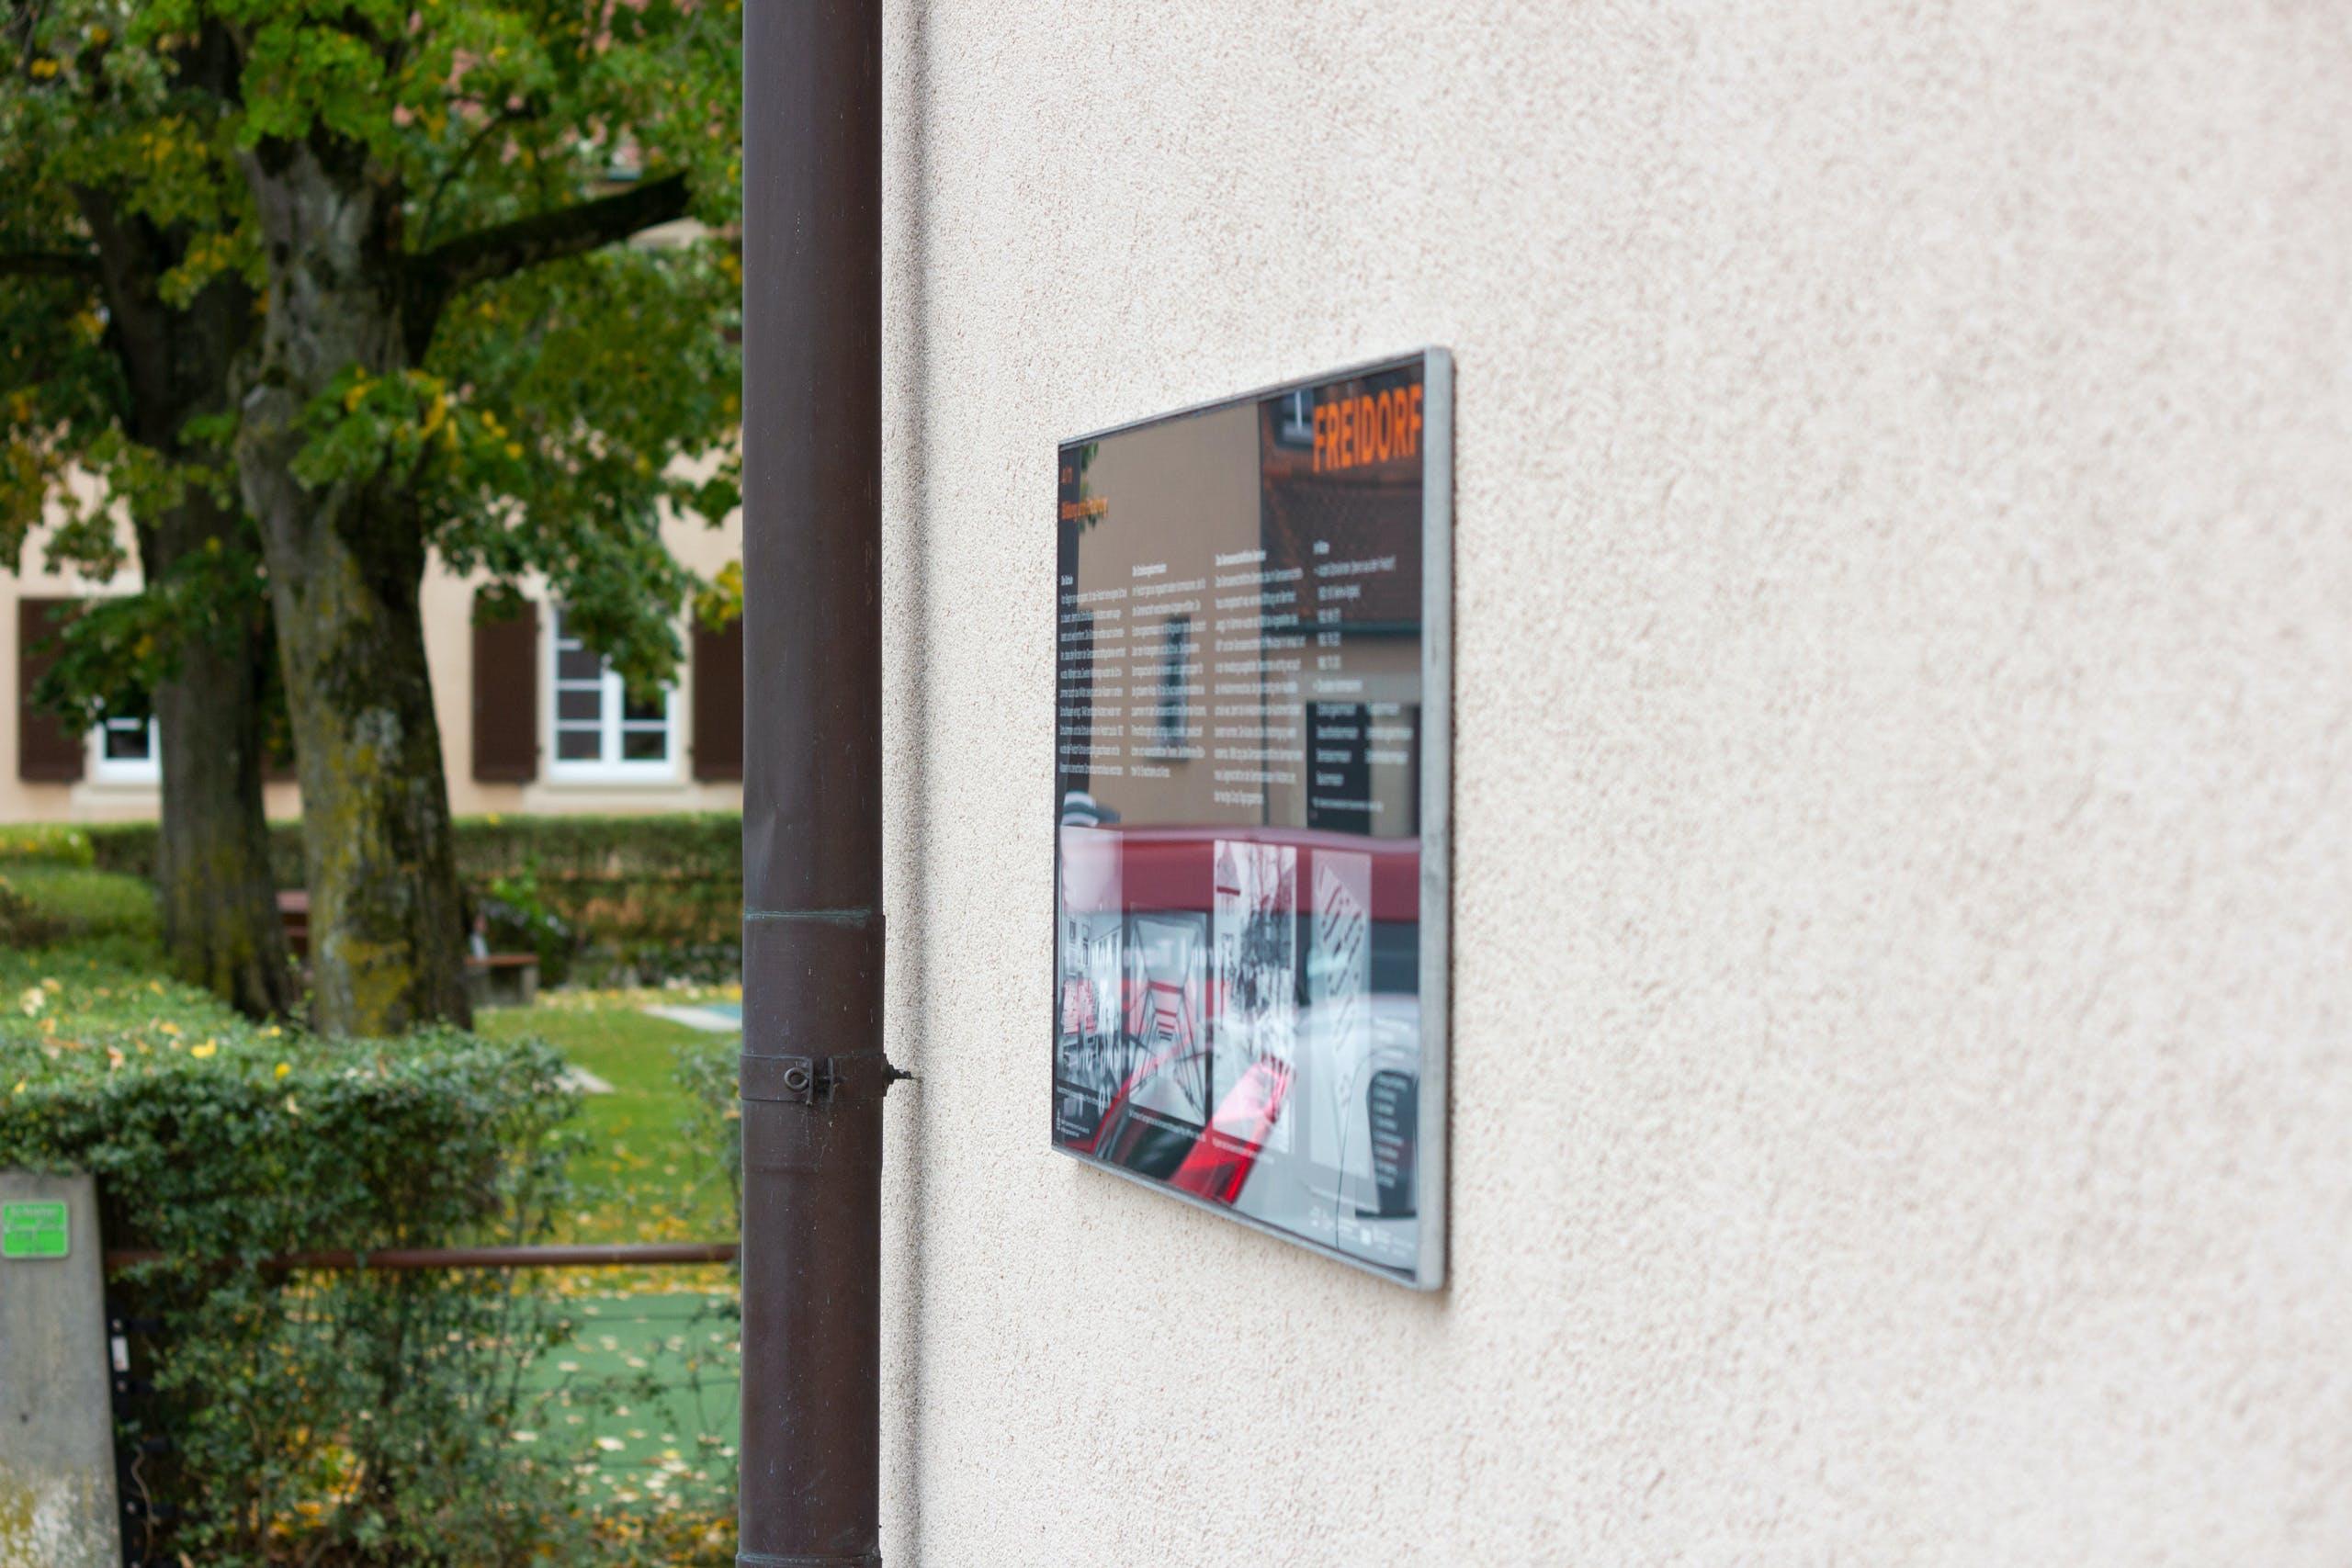 Freidorf-Muttenz, Basel, Publik Design, Gestaltung, Tafeln, Informationstafeln, Grafikdesign, Siedlung, Genossenschaft, Freidorf